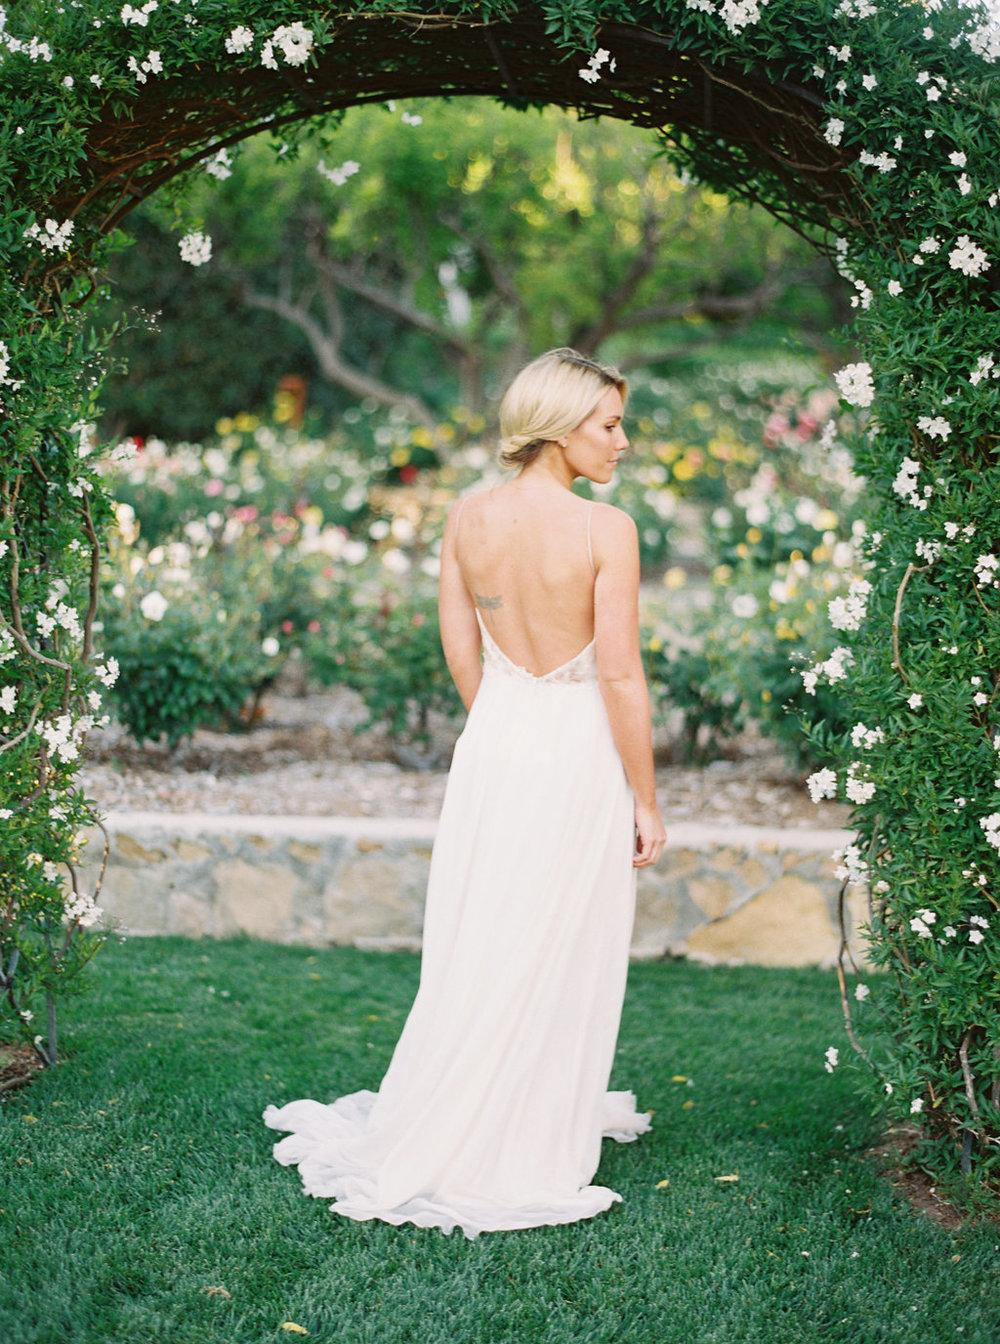 Organic Bridal Portrait